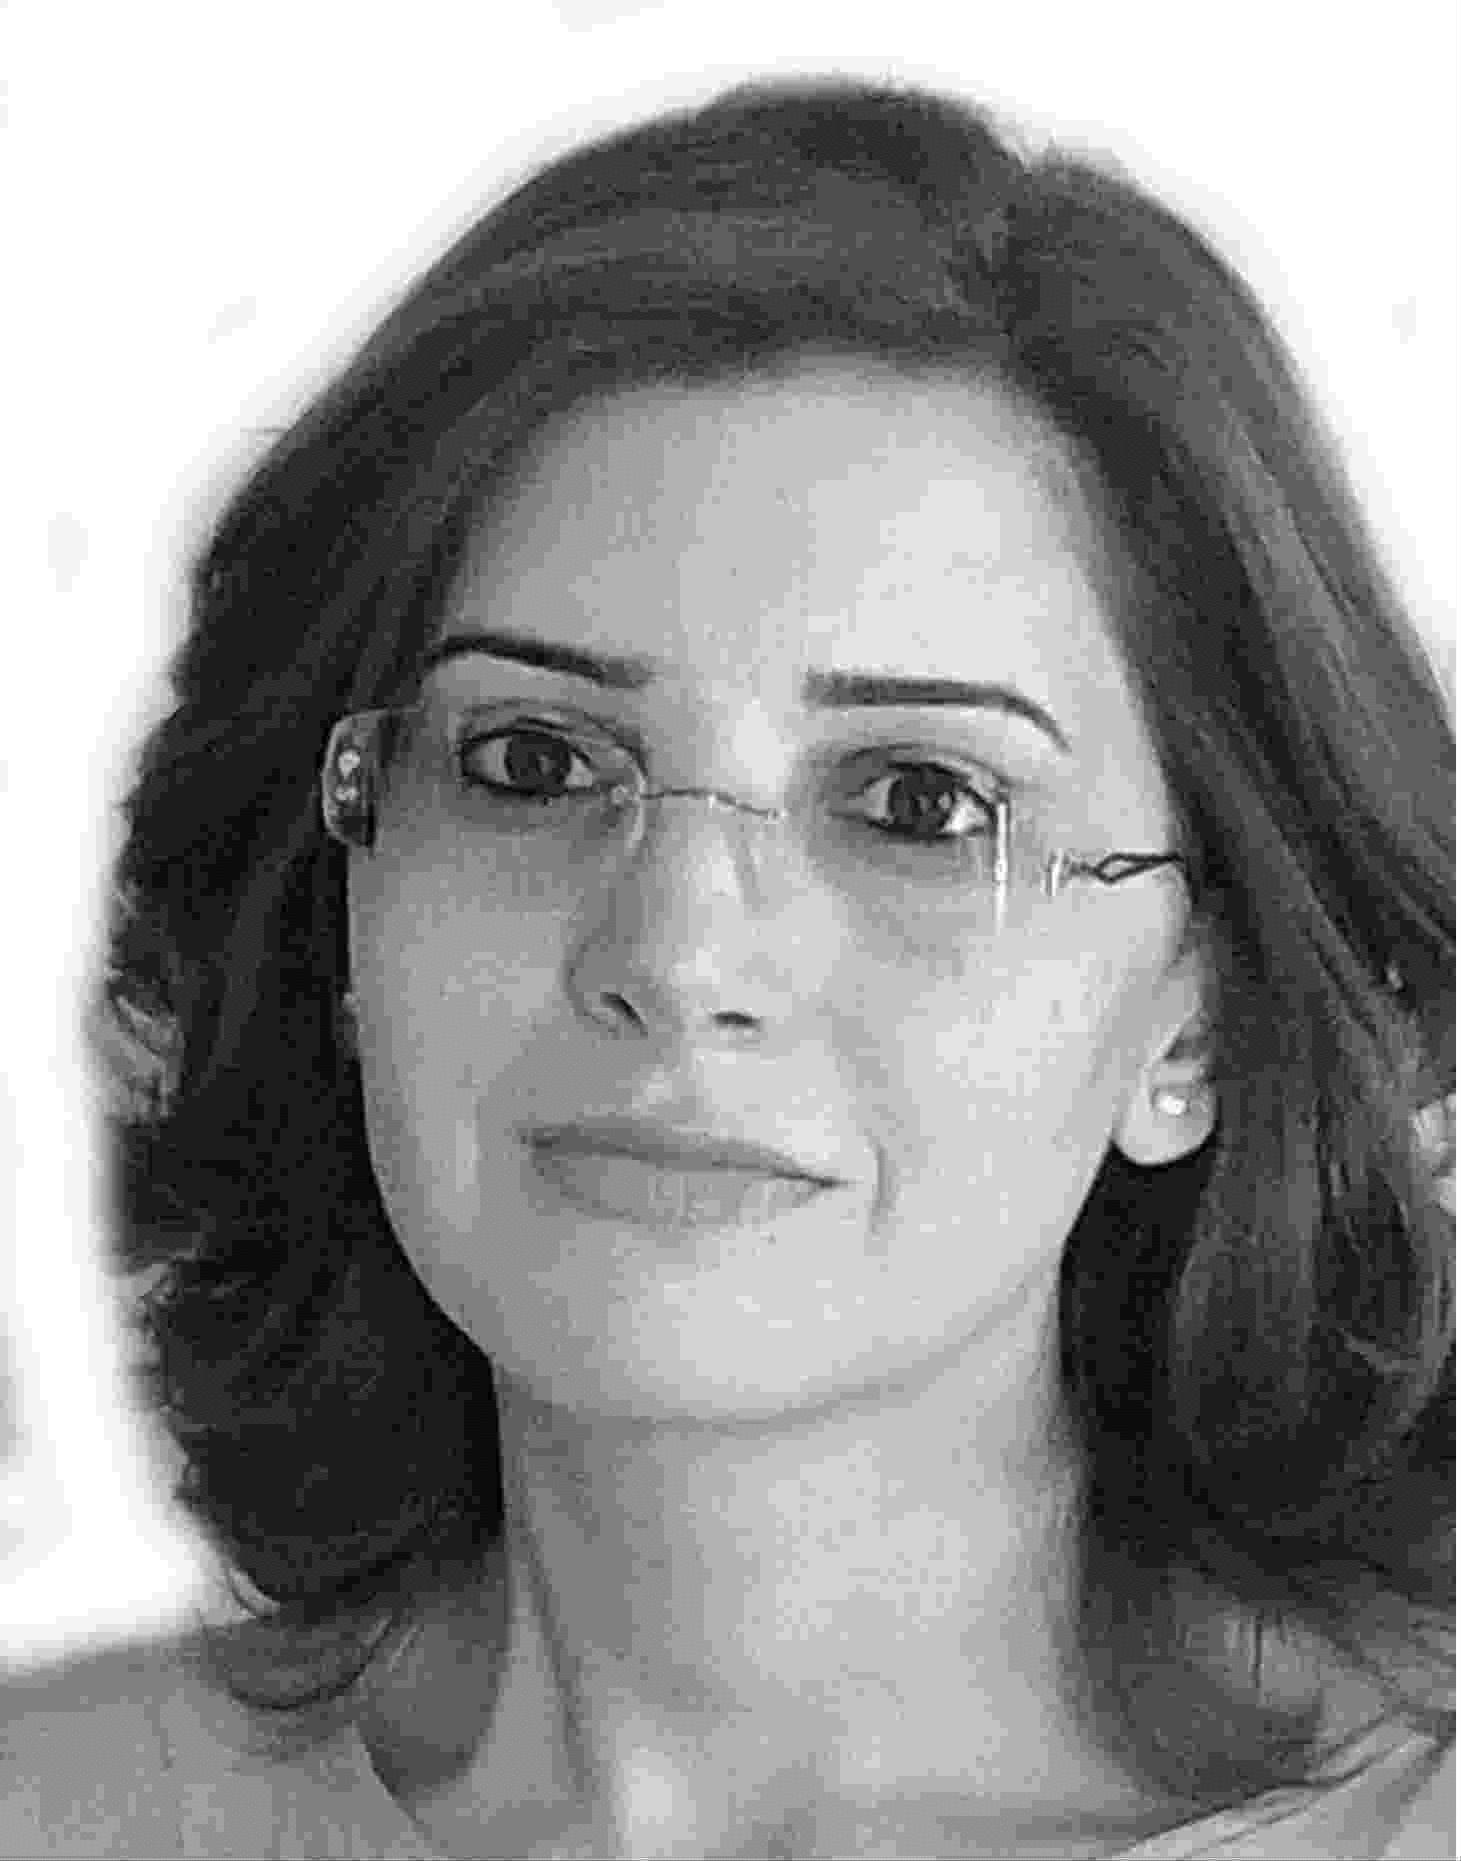 Soumaya Gharsallah-Hizem